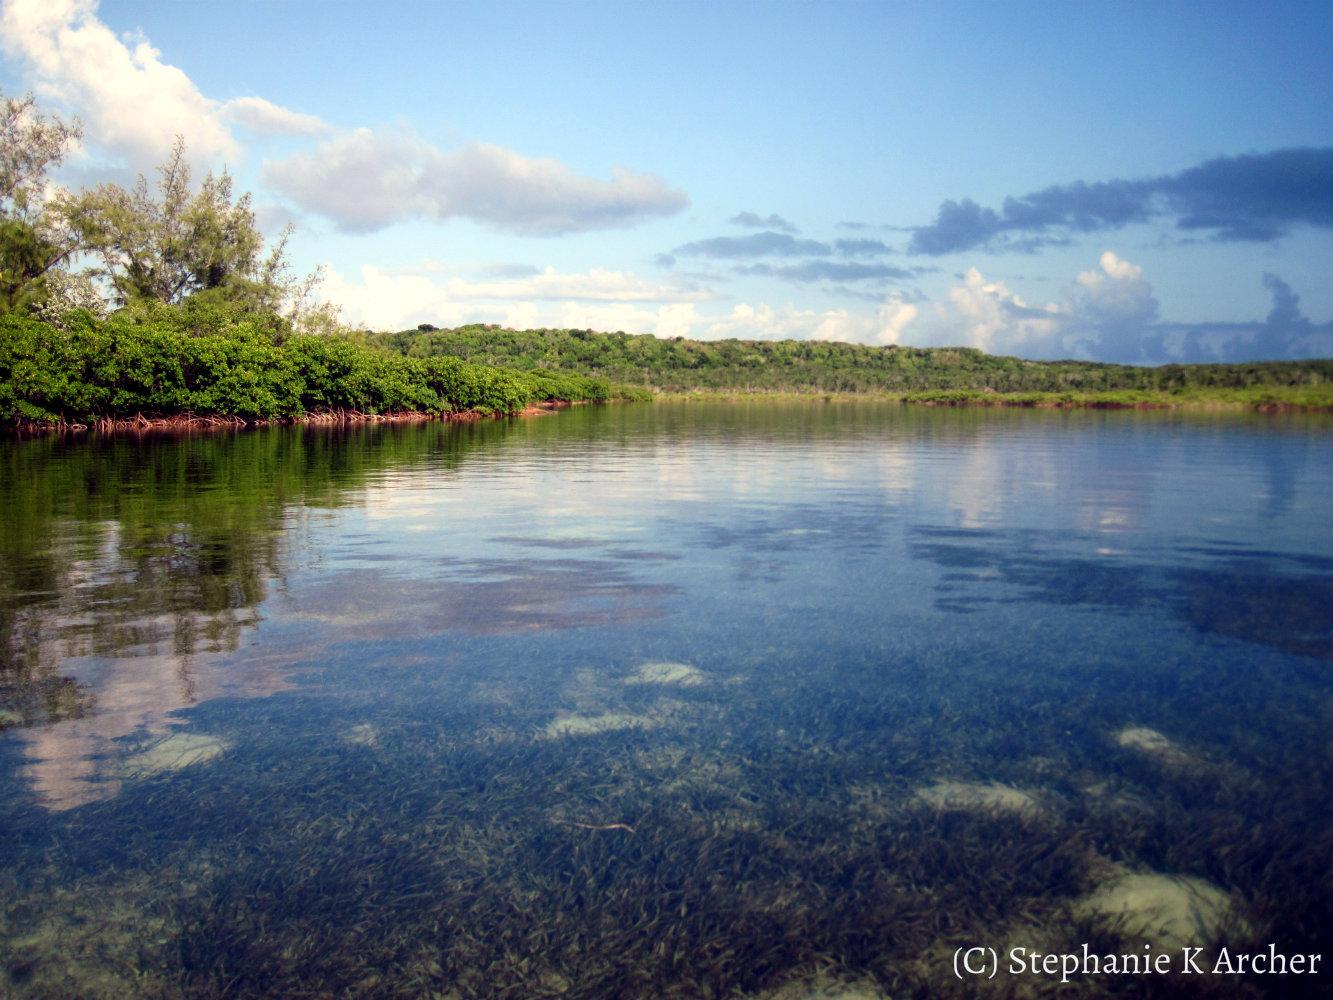 Seagrass_tidalcreek.jpg